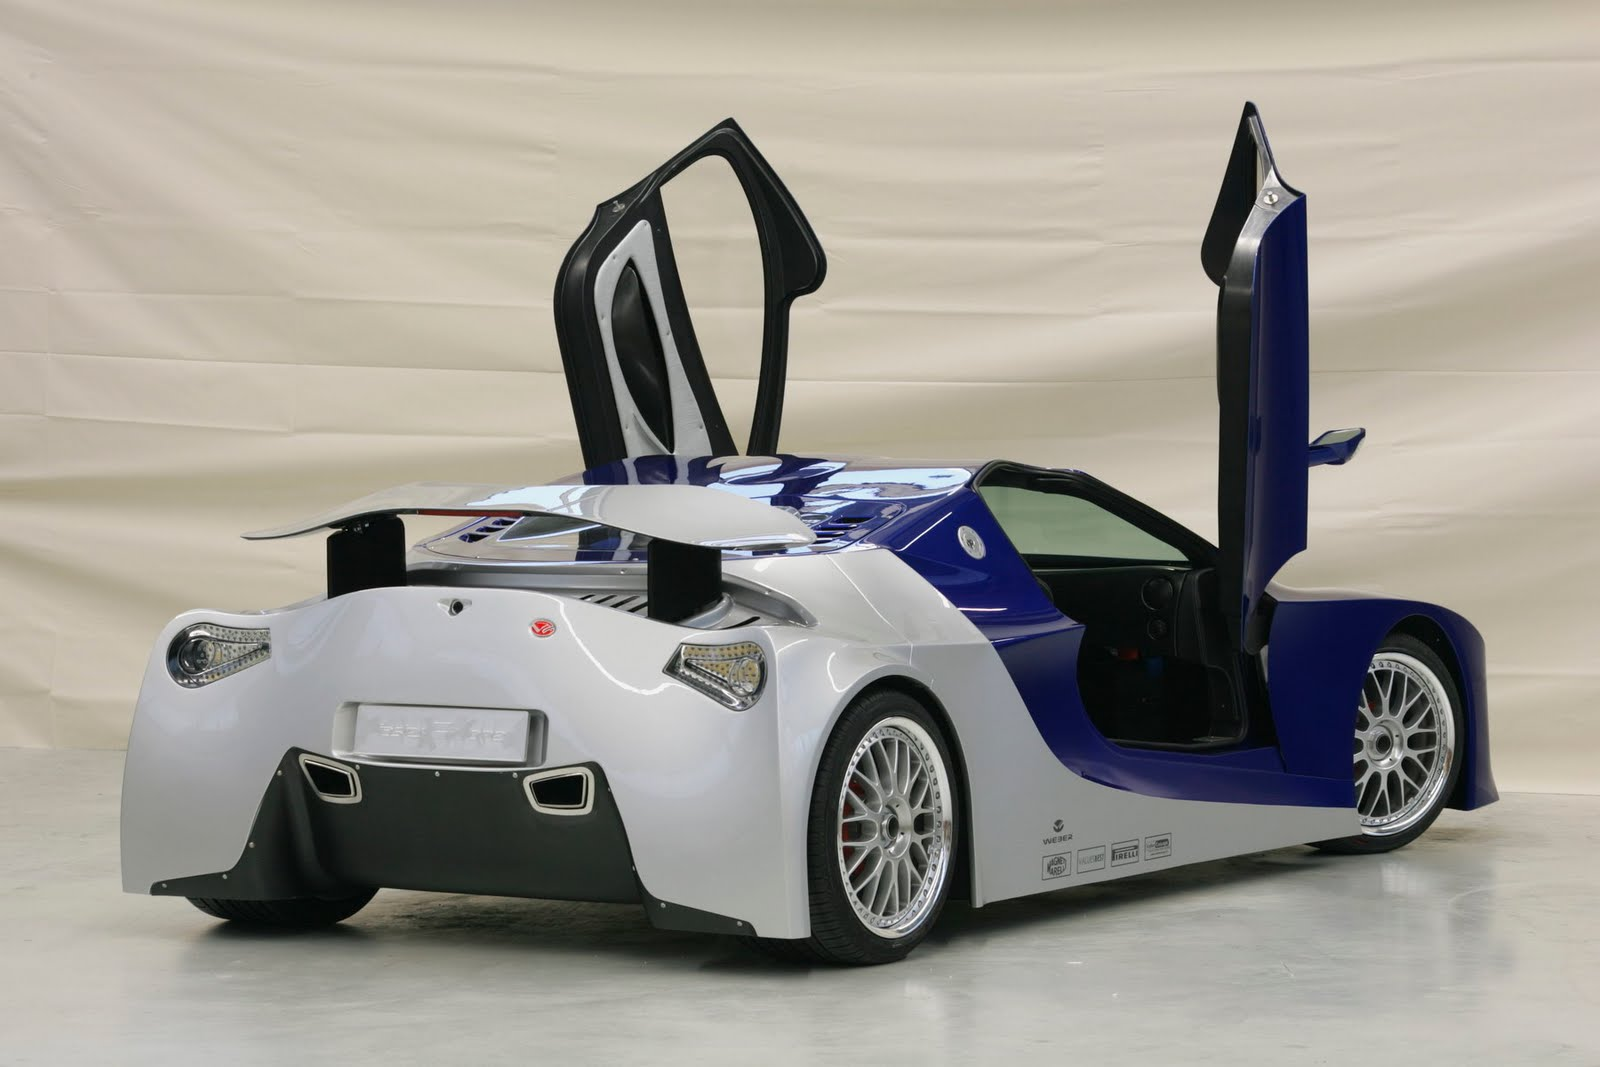 http://1.bp.blogspot.com/_1PgmqFO-Stk/S-3j6_T27HI/AAAAAAAAAgY/Hp0VApRTKV4/s1600/weber-sportcars-faster-one-hr-03.jpg